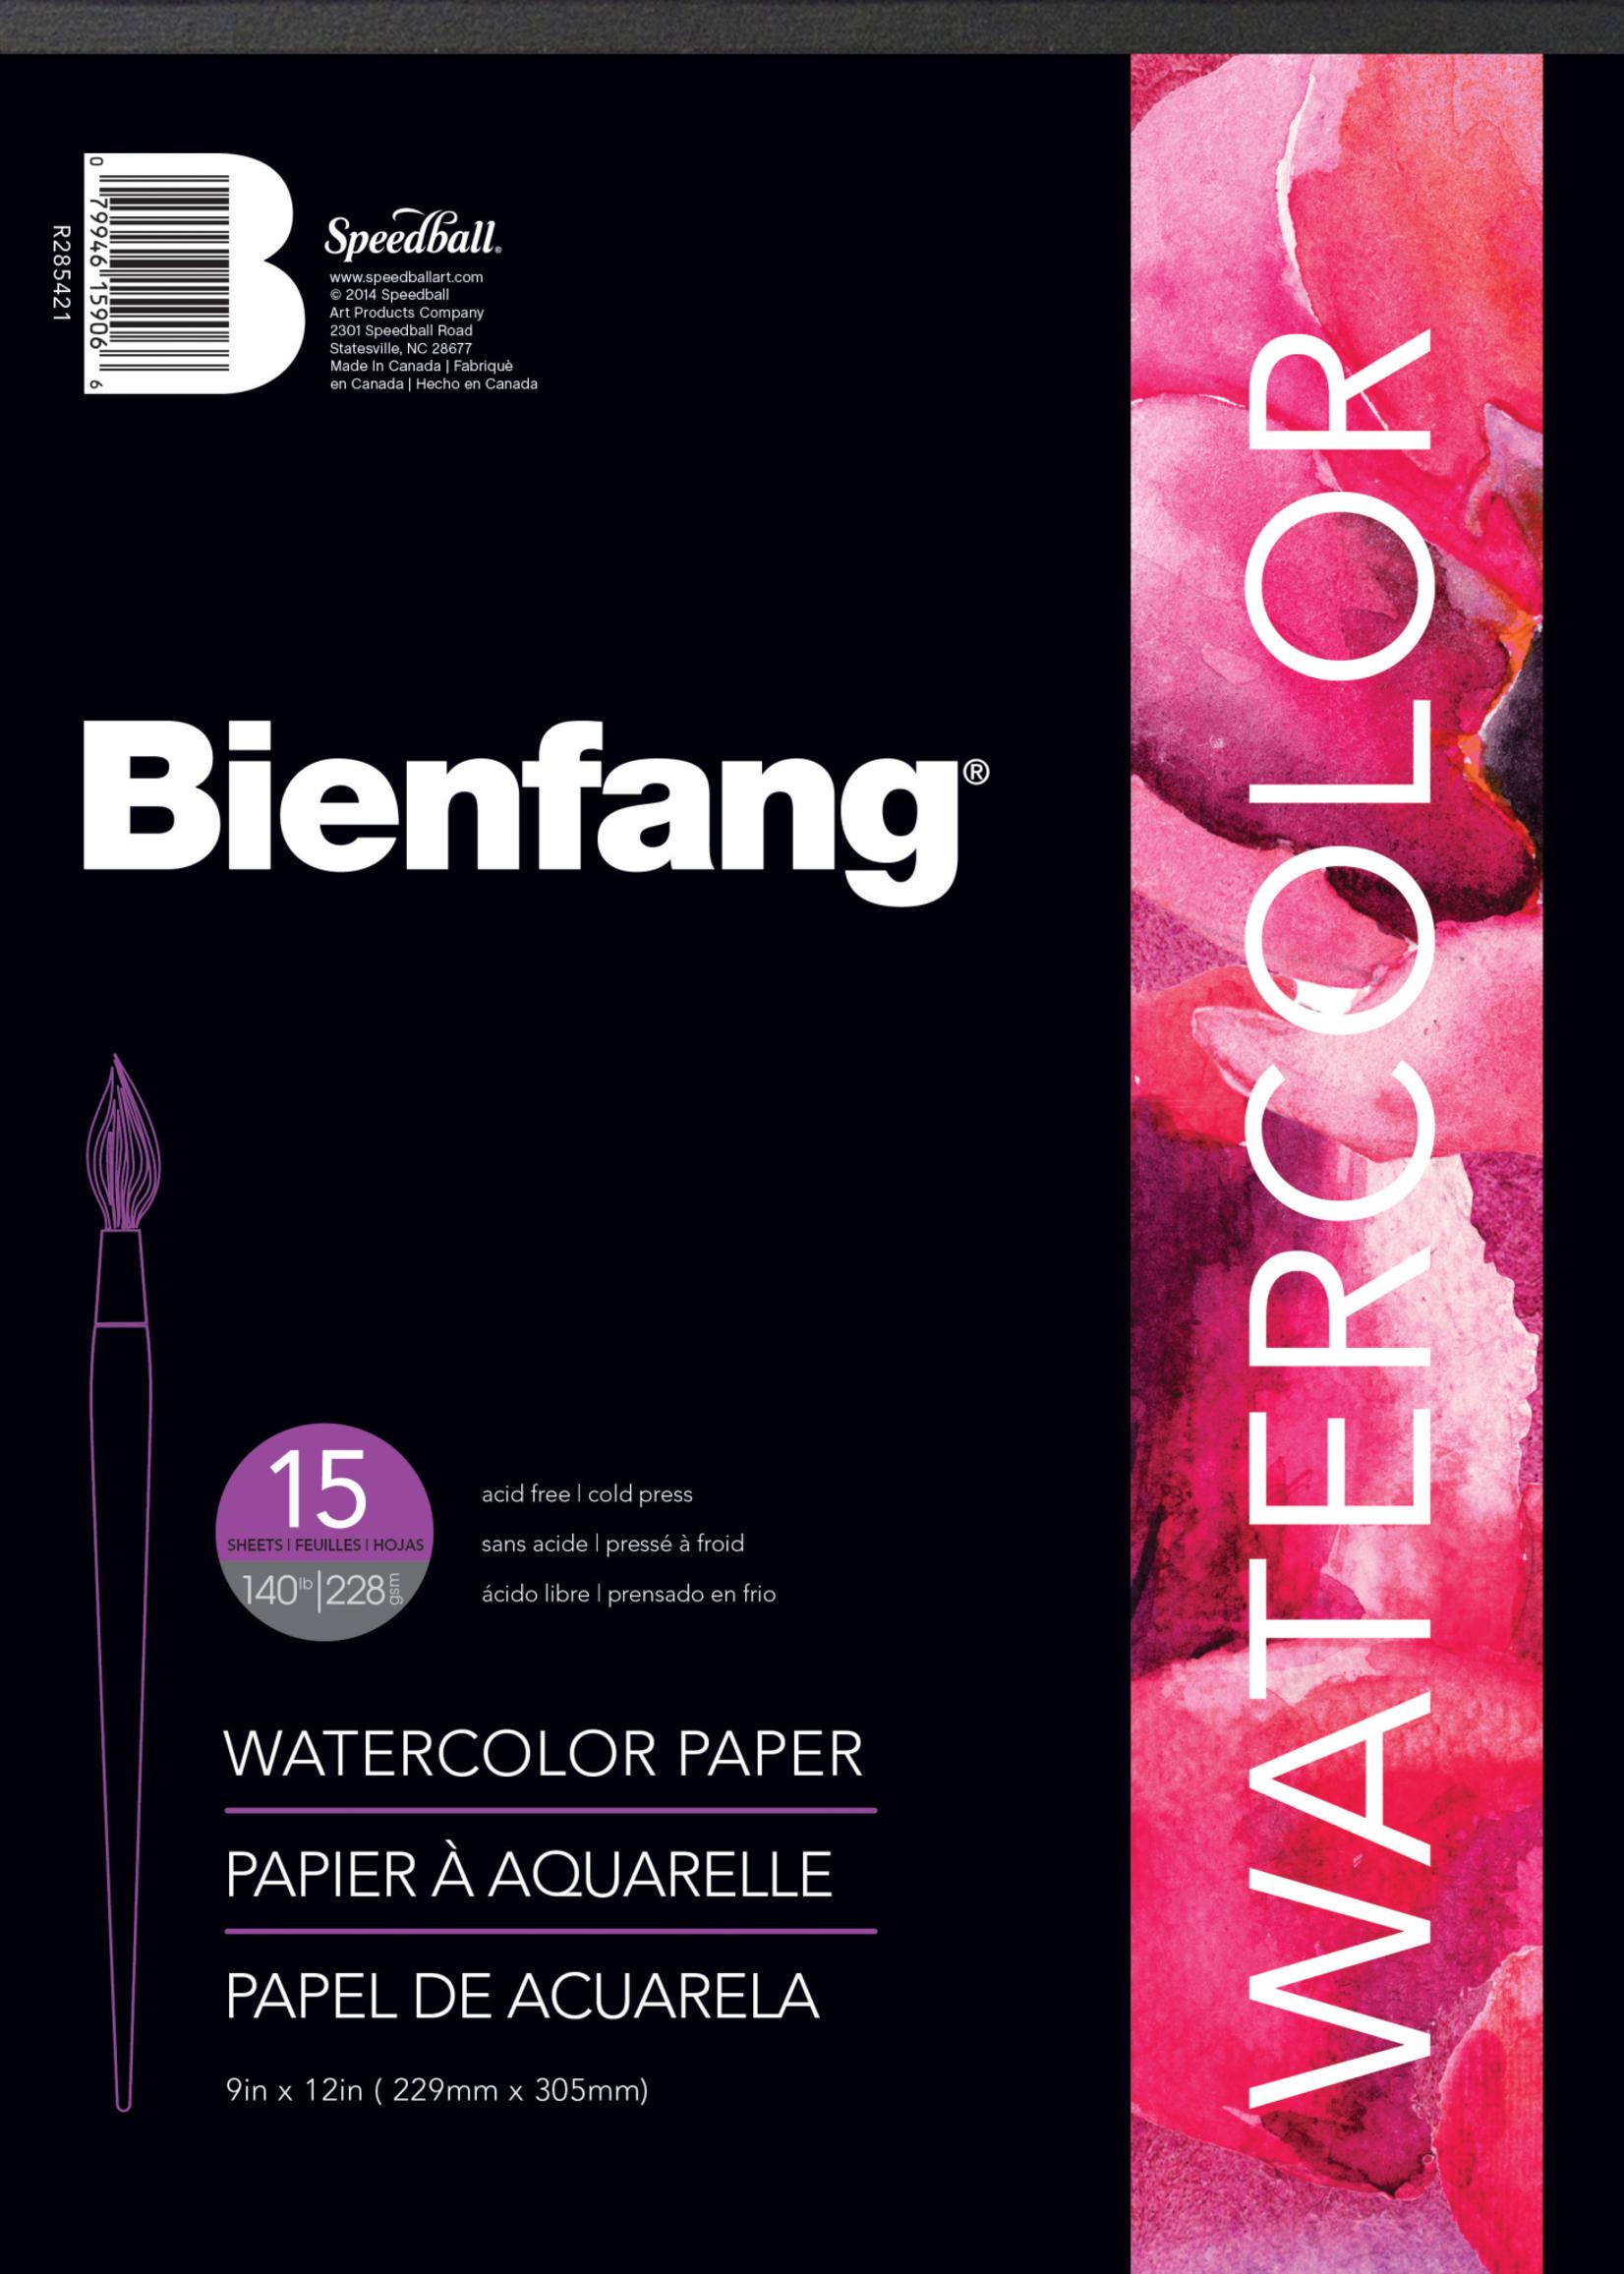 BIENFANG PAPER BIENFANG WATERCOLOR PAPER PAD